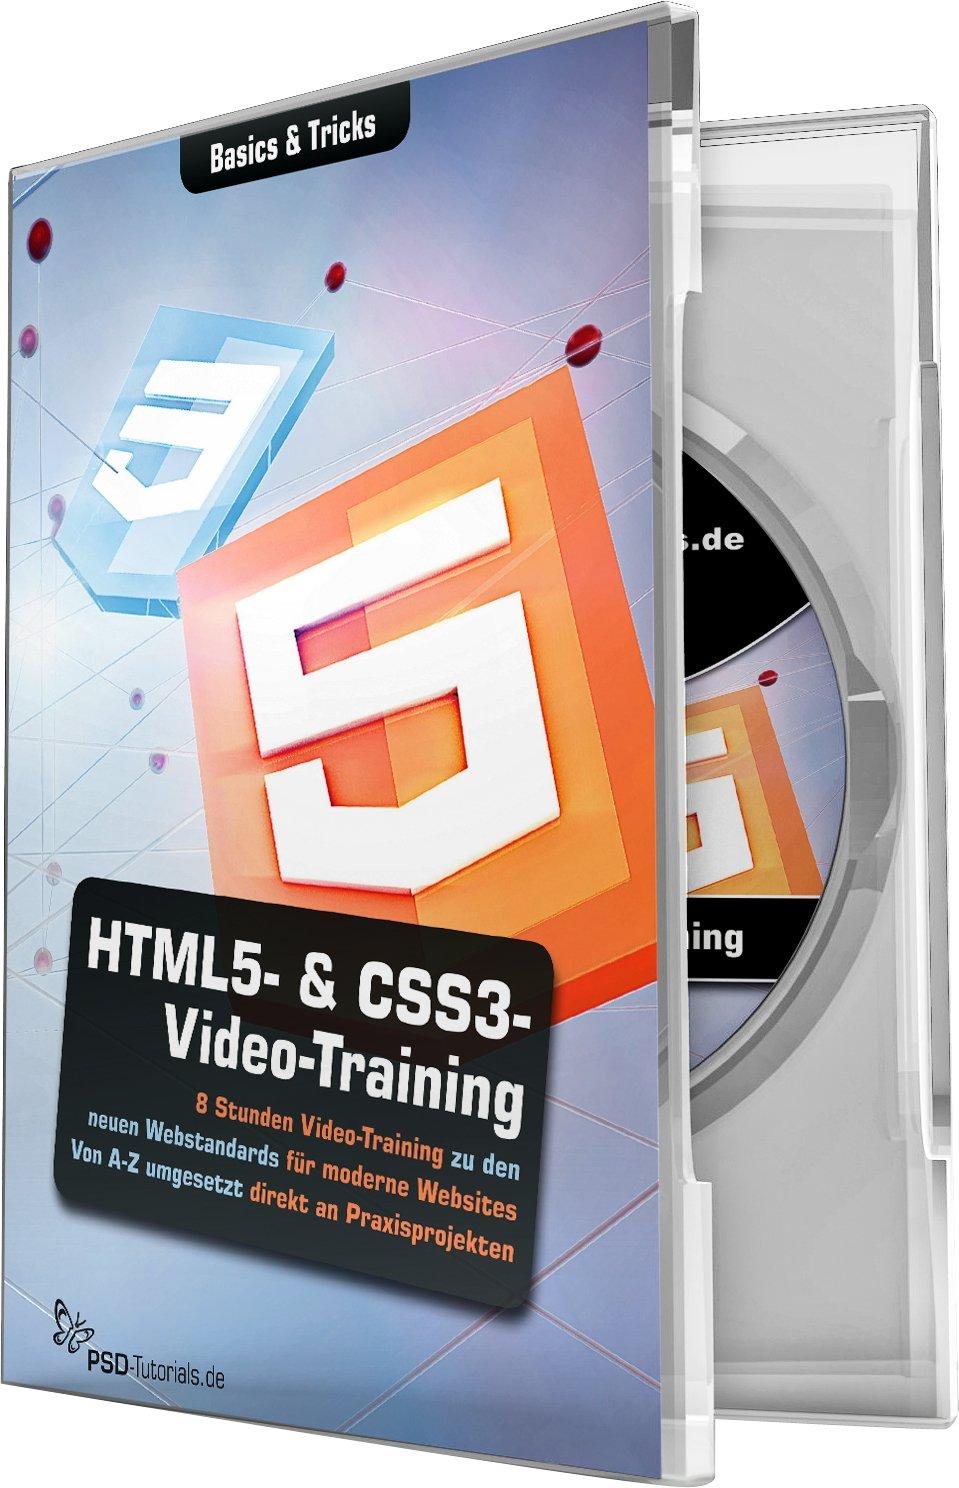 html5-css3-video-training